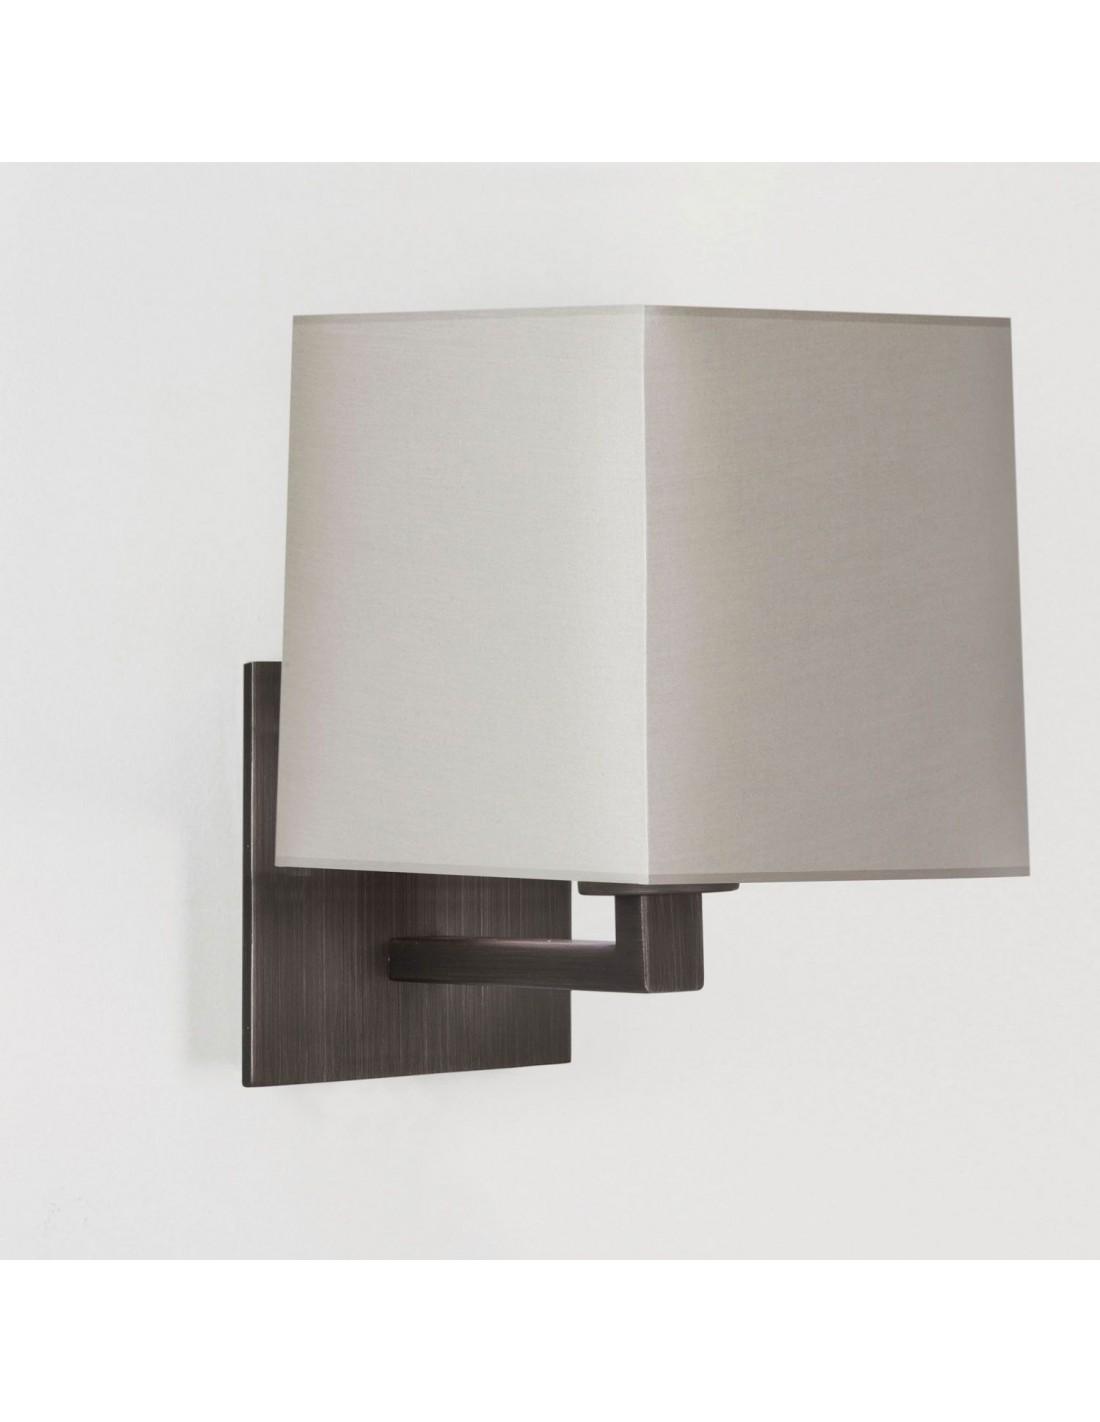 applique azumi bronze avec abat jour carr. Black Bedroom Furniture Sets. Home Design Ideas